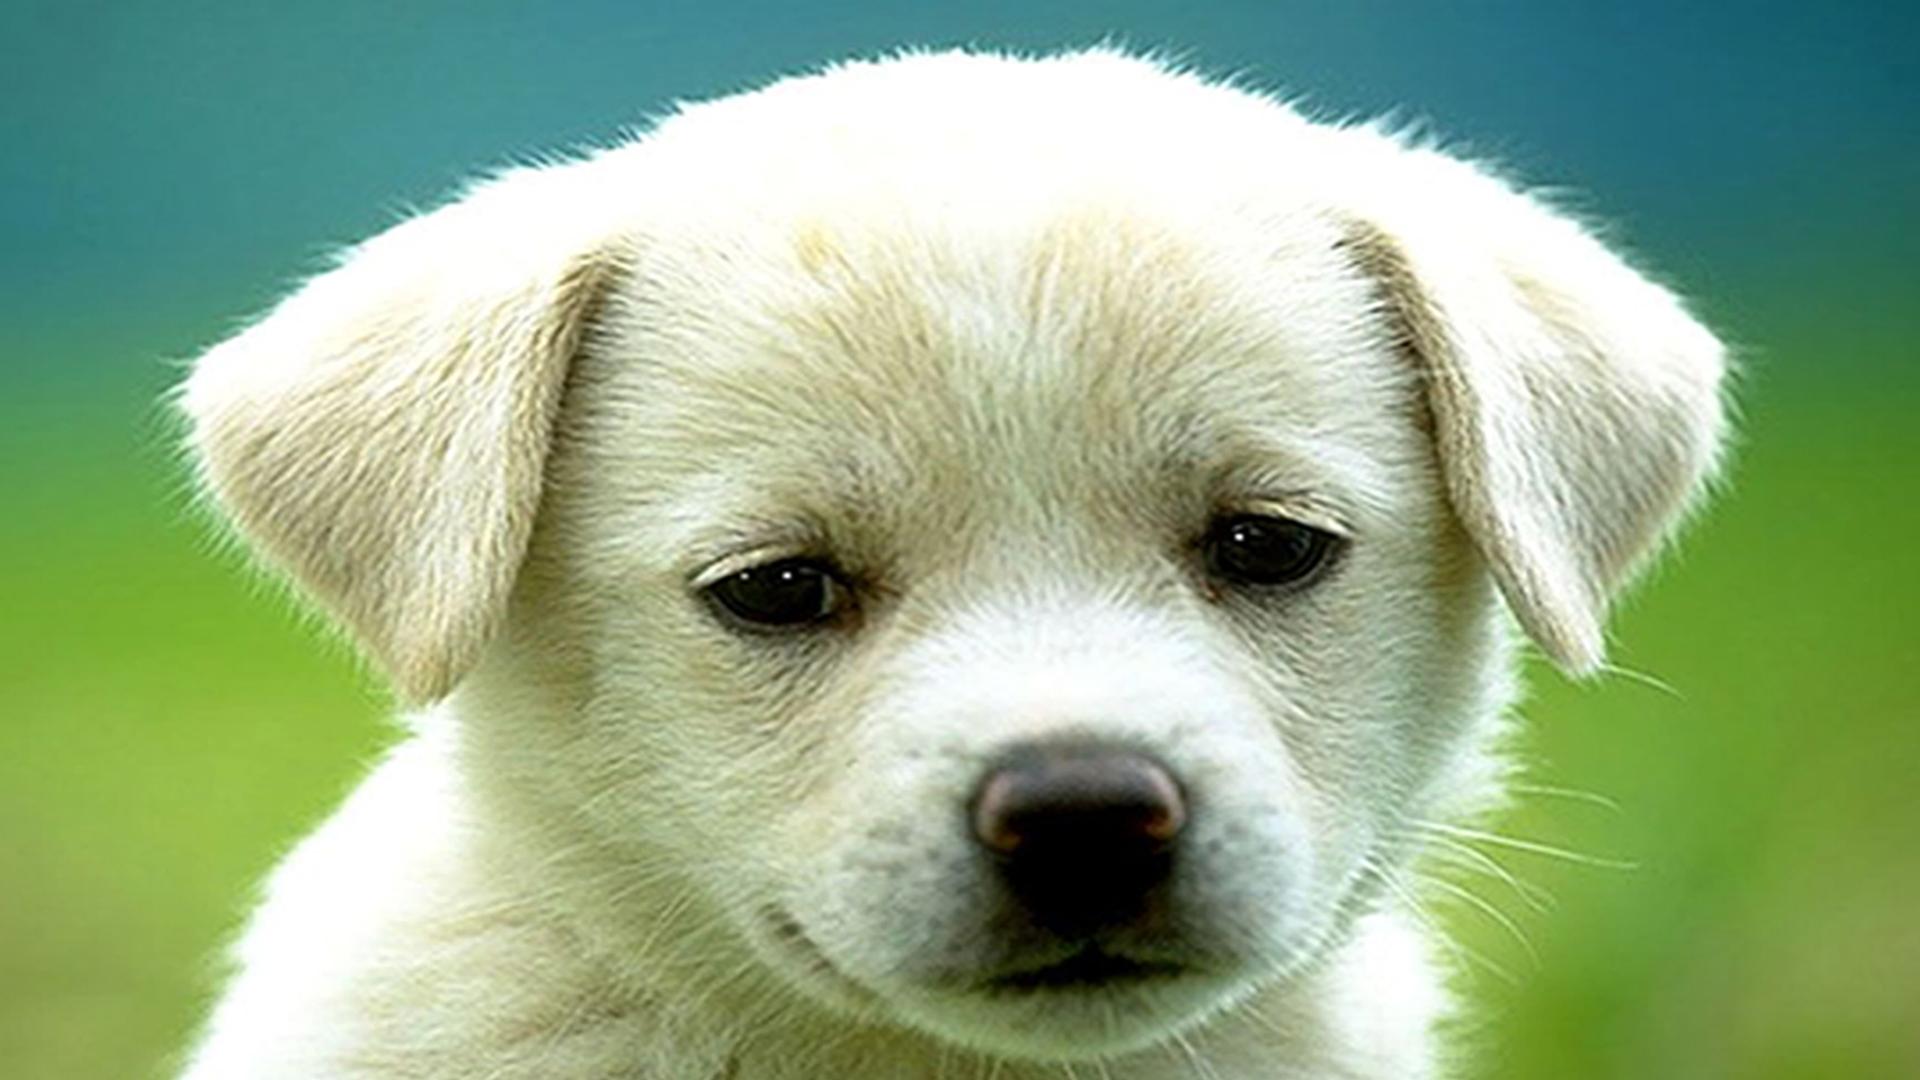 dog puppy desktop 1920x1080 dog puppy desktop 1920x1080 wallpaper 1920x1080